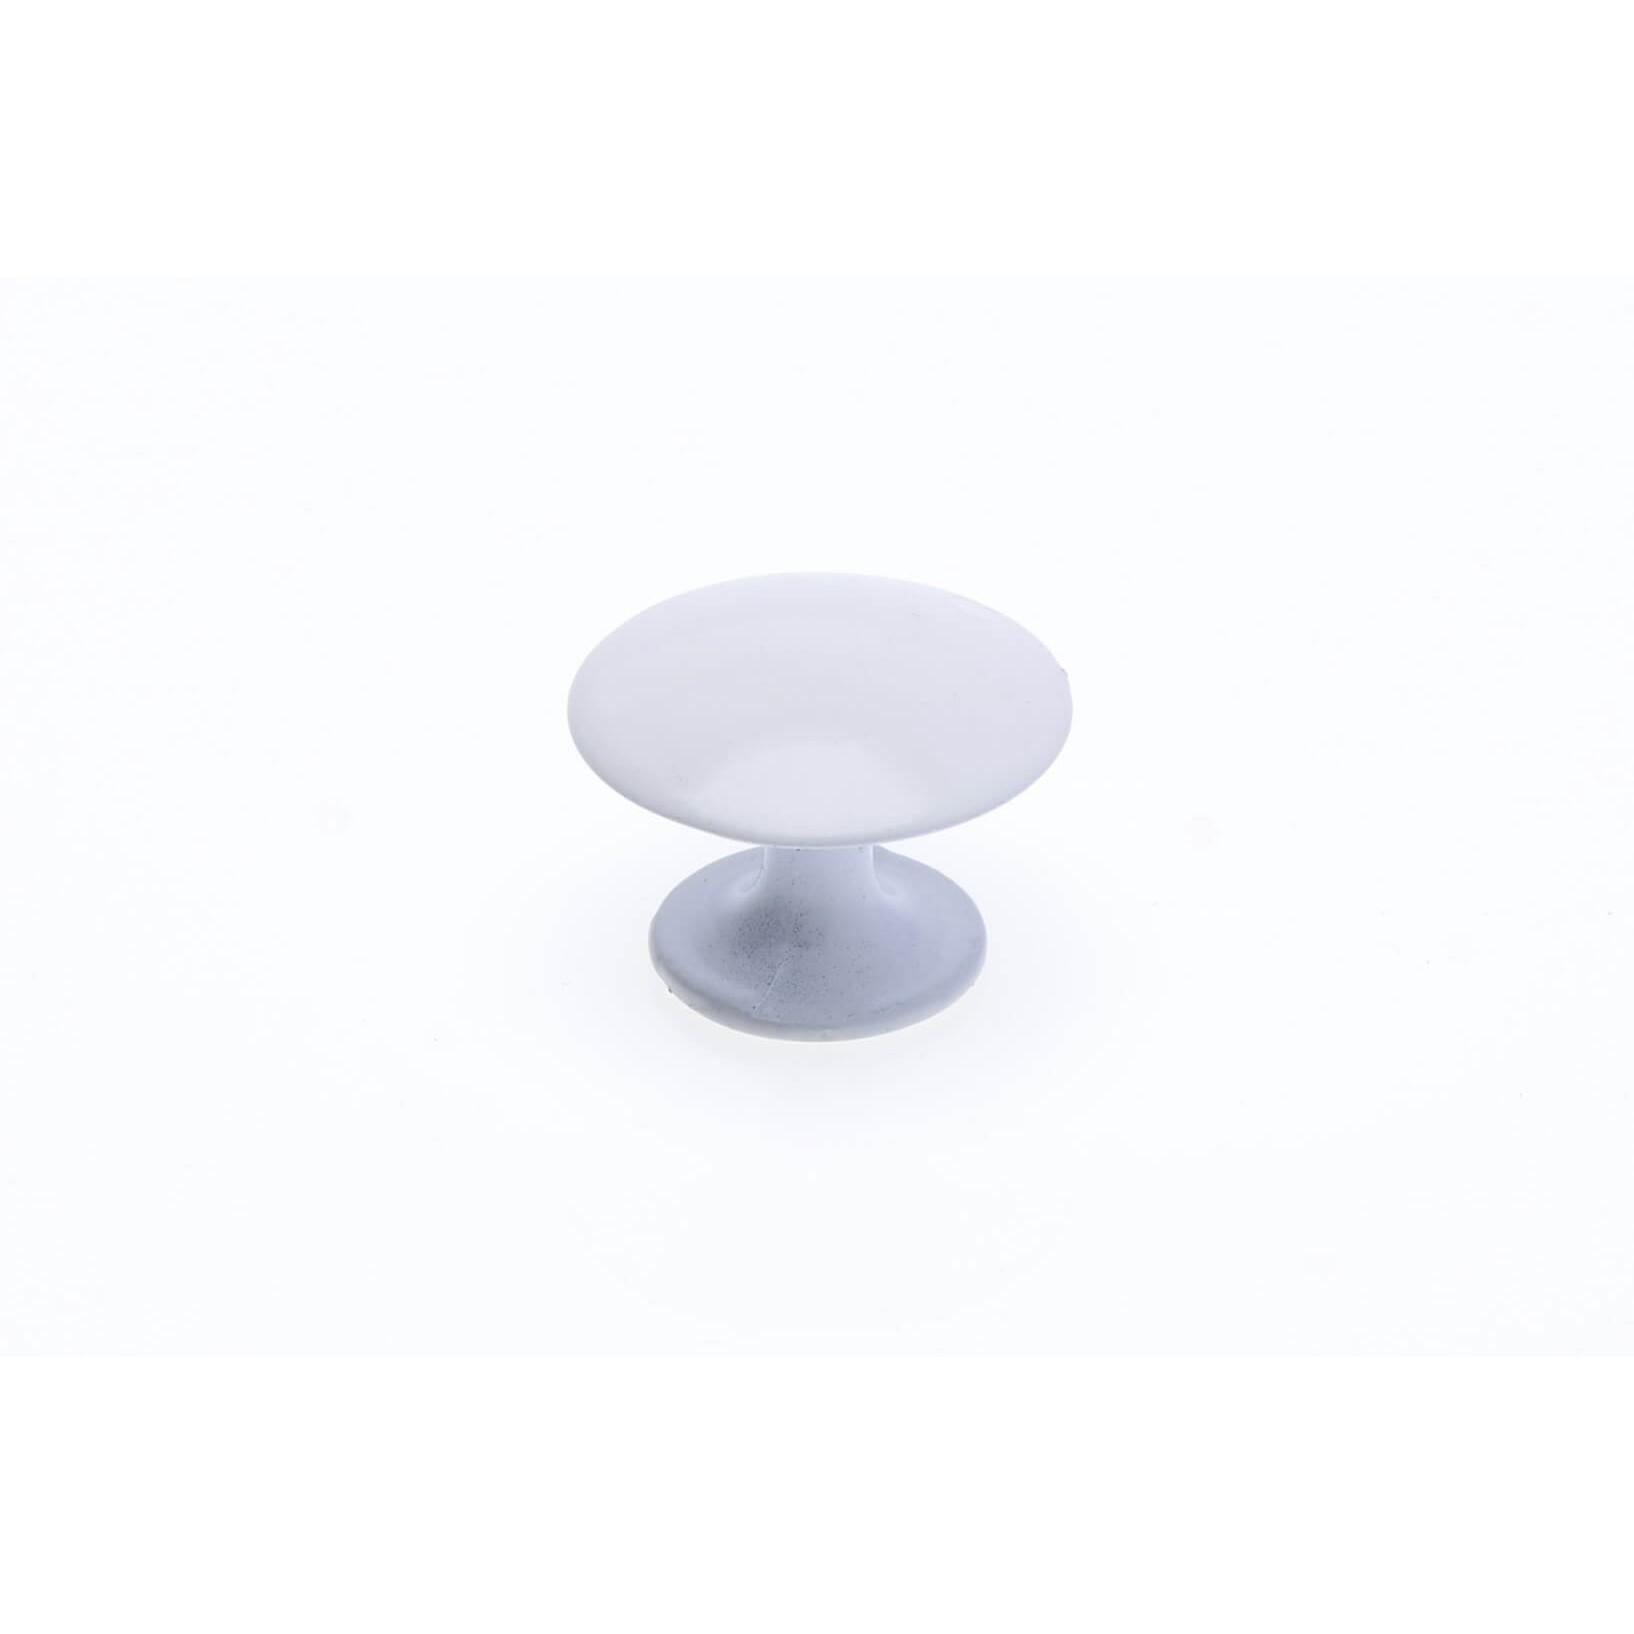 Puxador para Moveis Branco Fosco 25mm Cogumelo - Hastvel